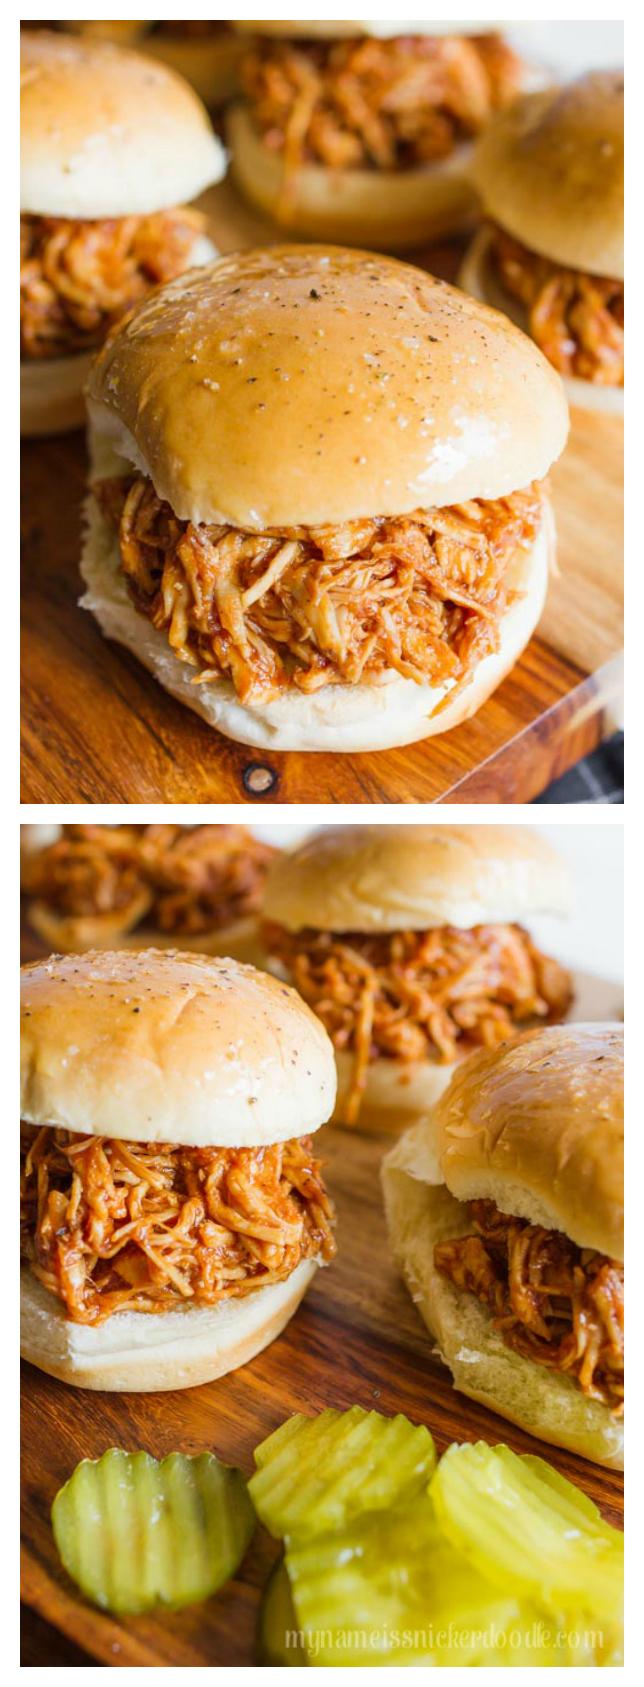 Splendid Instant Pot Bbq Ken Sliders Bbq Ken Sliders Sides Bbq Ken Sliders Recipe Crock Pot nice food Bbq Chicken Sliders